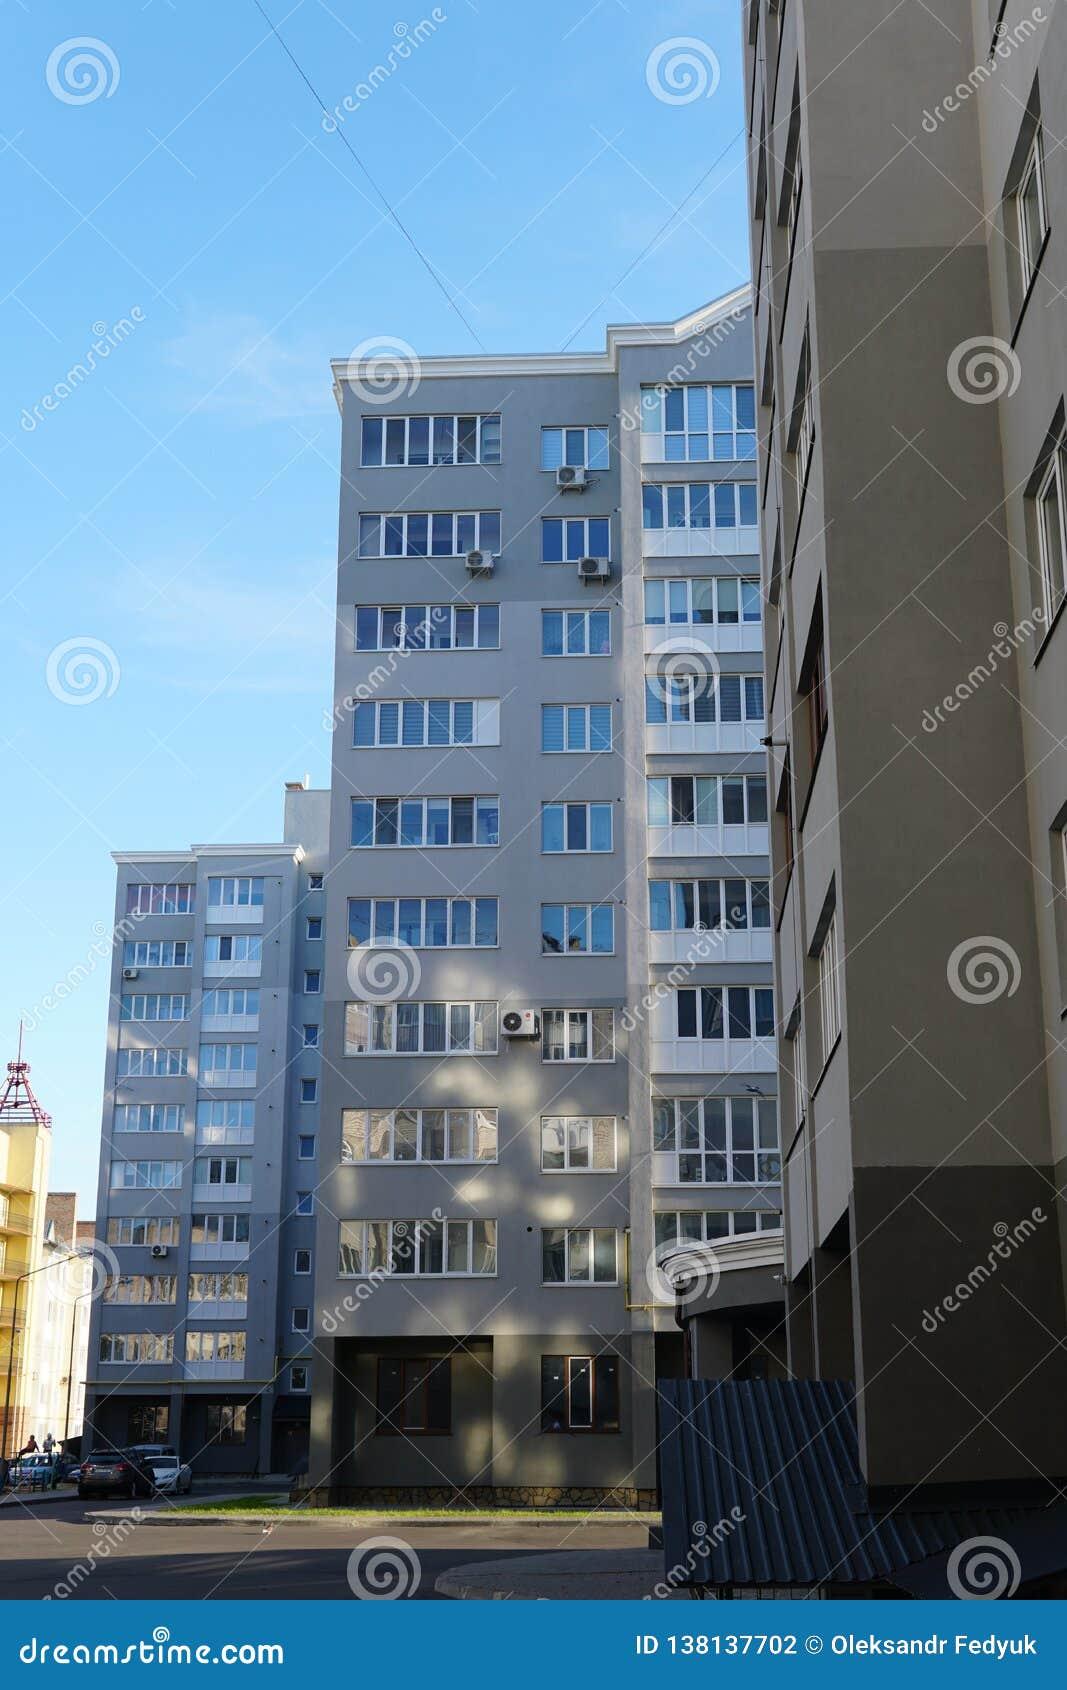 Modern condominium building real etate in city with blue sky